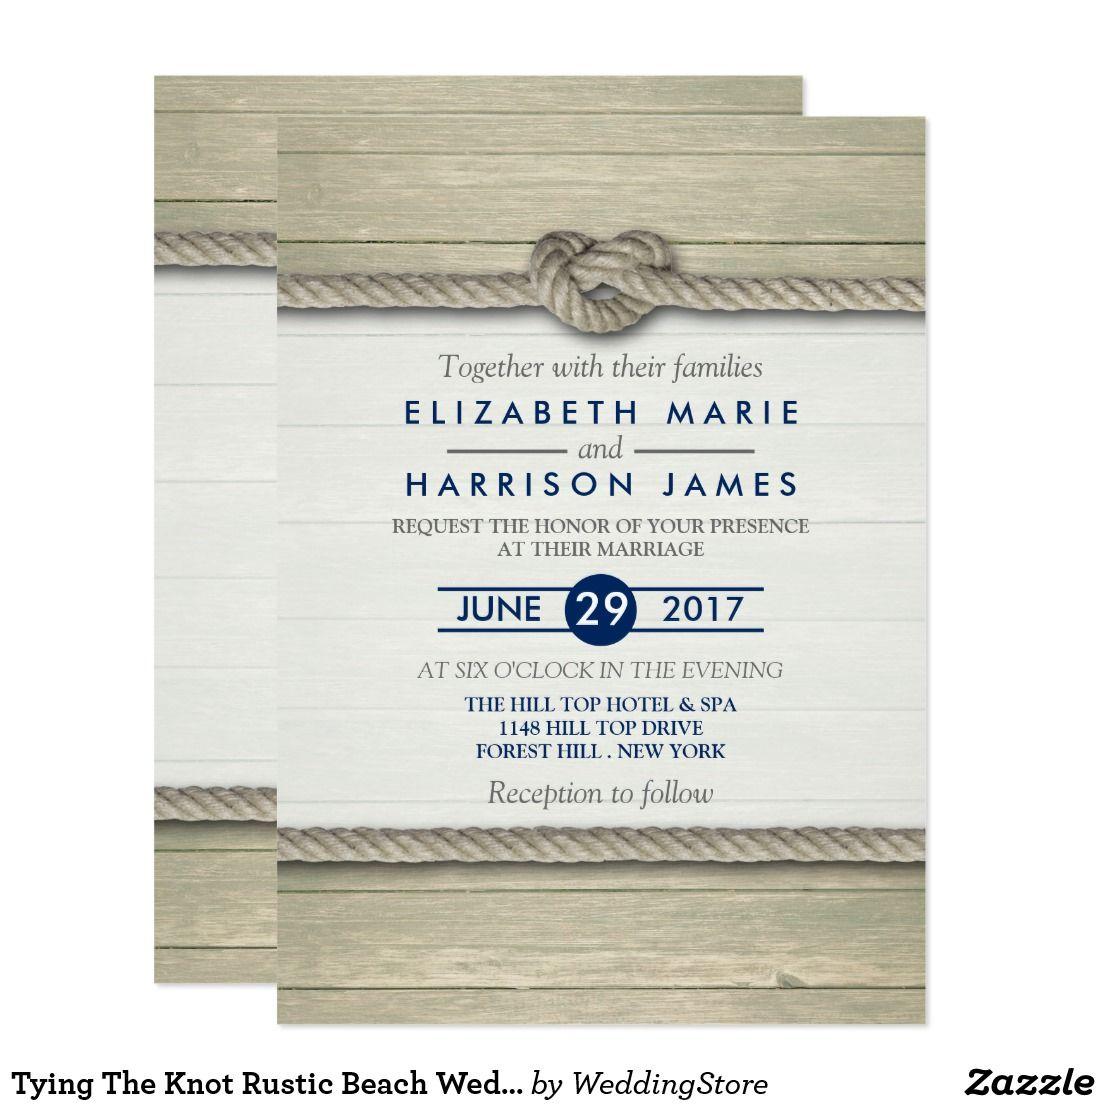 Tying The Knot Rustic Beach Wedding Card | Rustic Beach Invitations ...